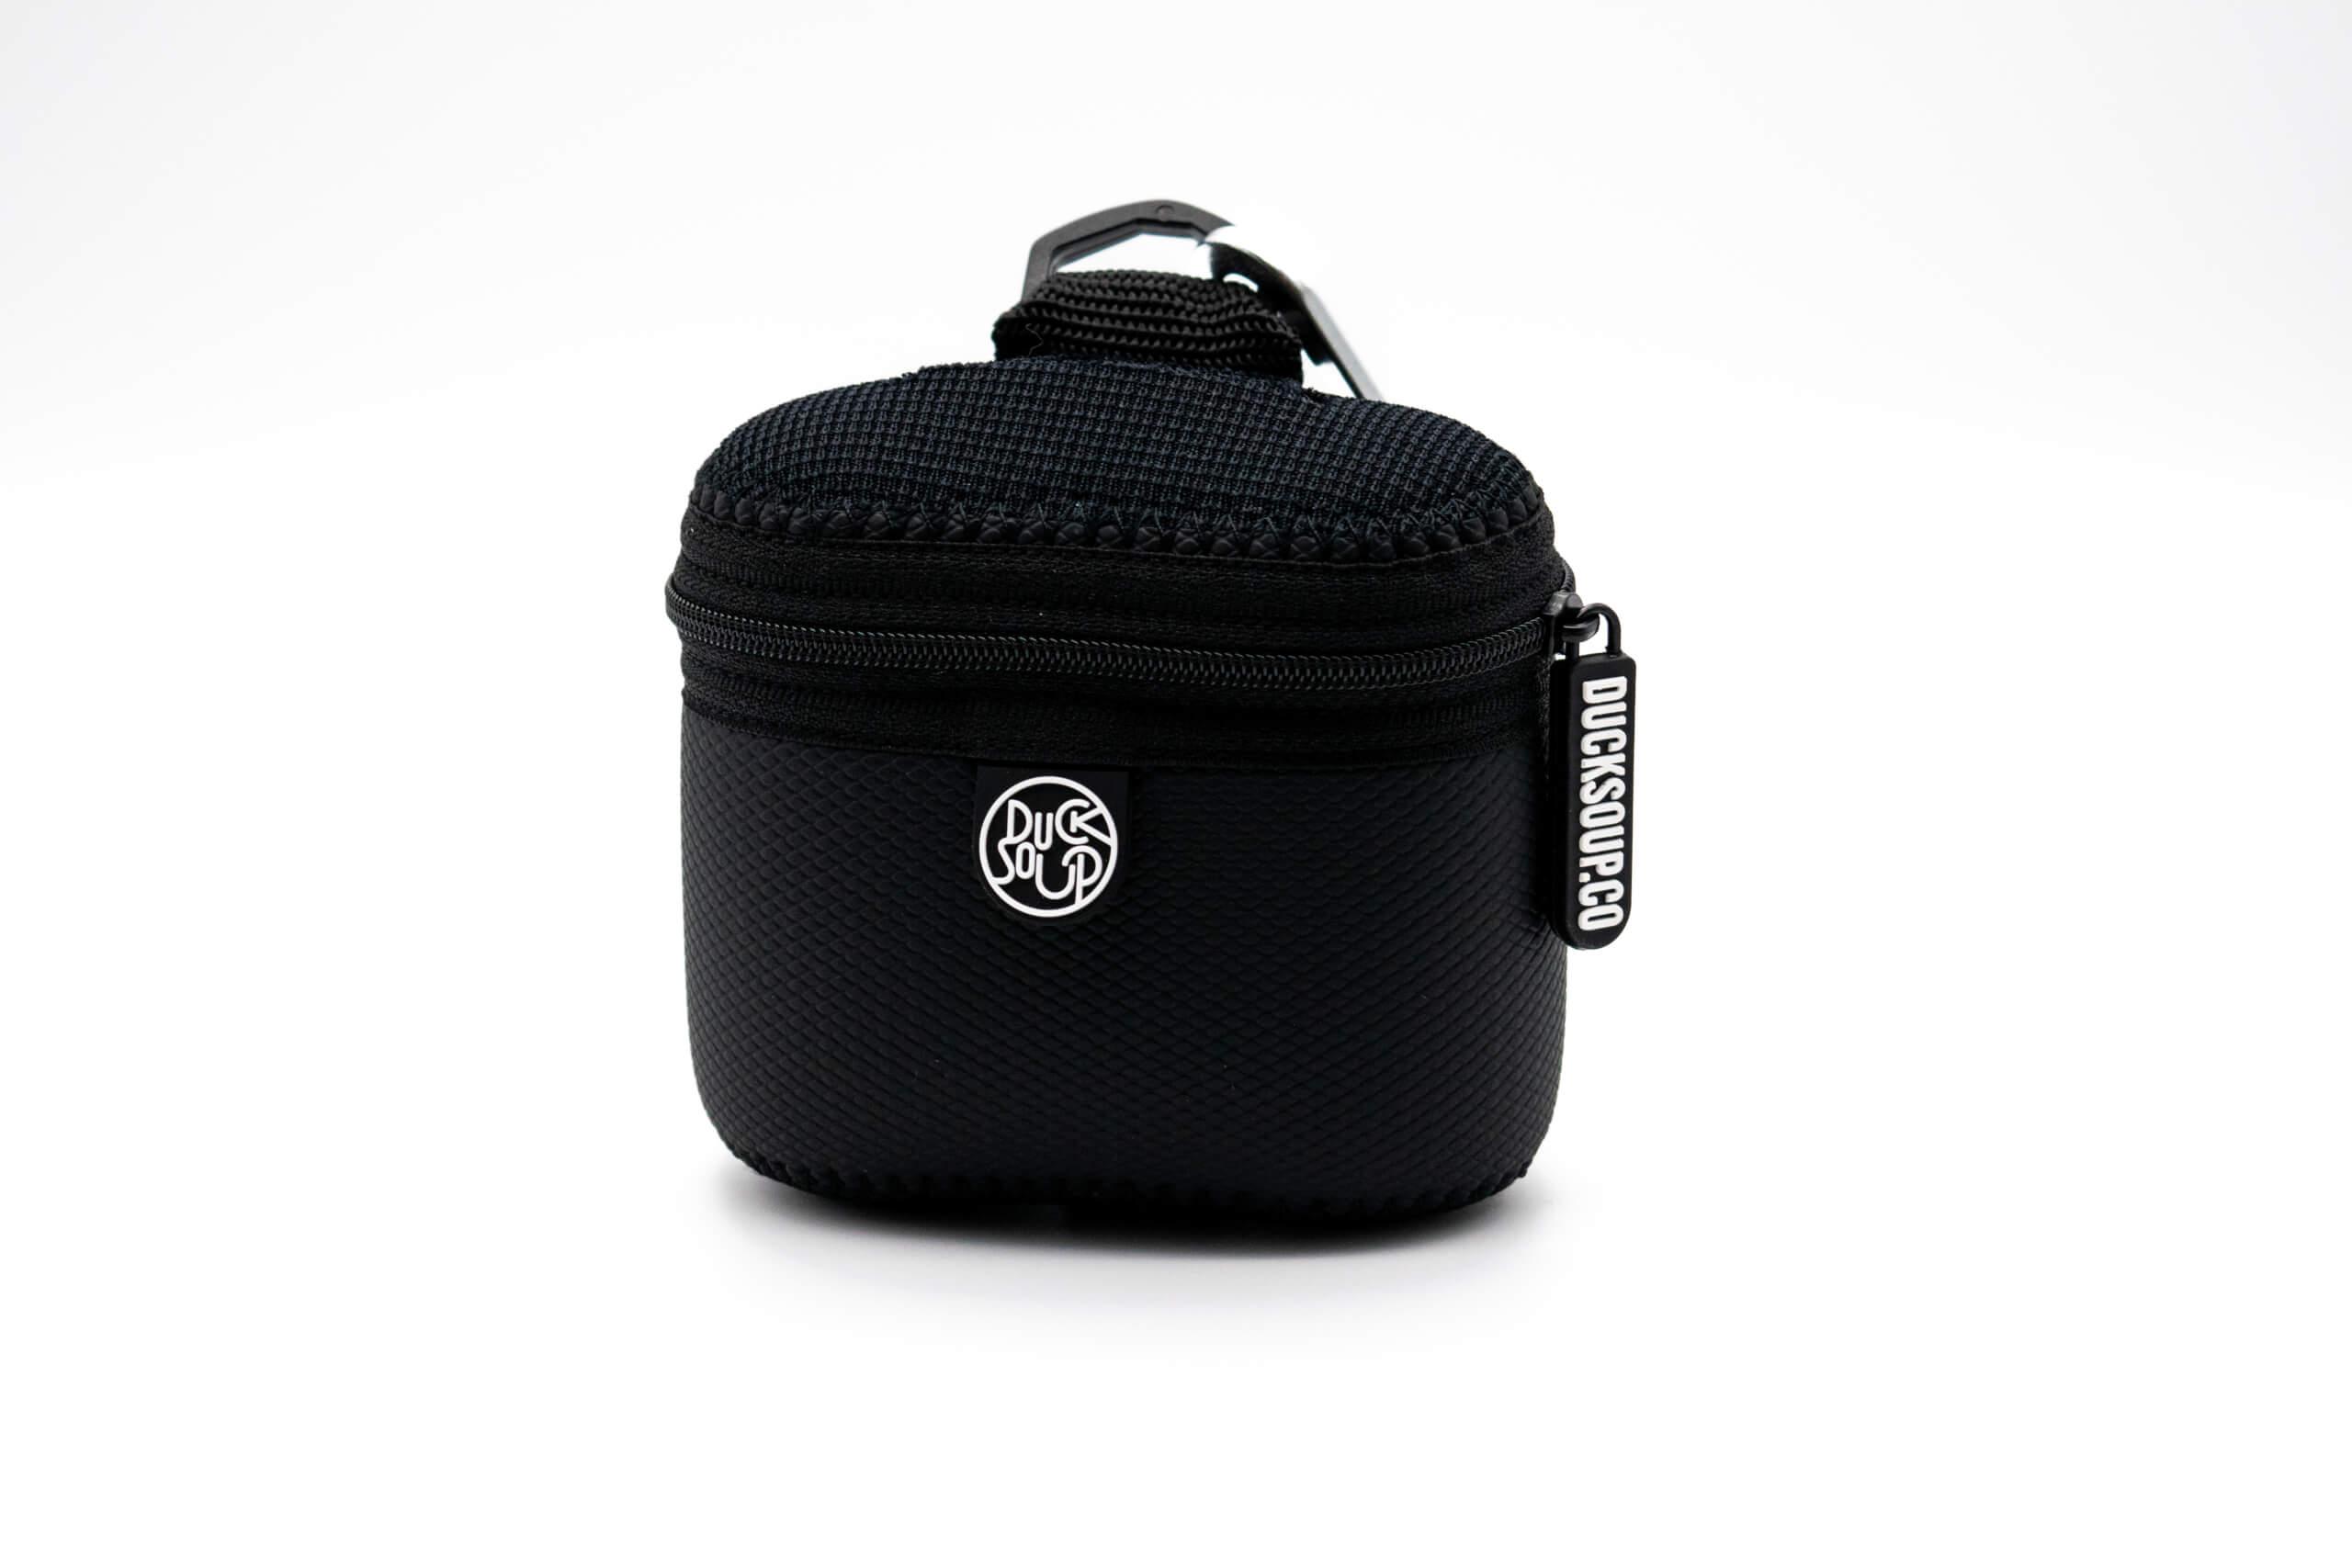 Black Neo-Skin Treat Bag Front View